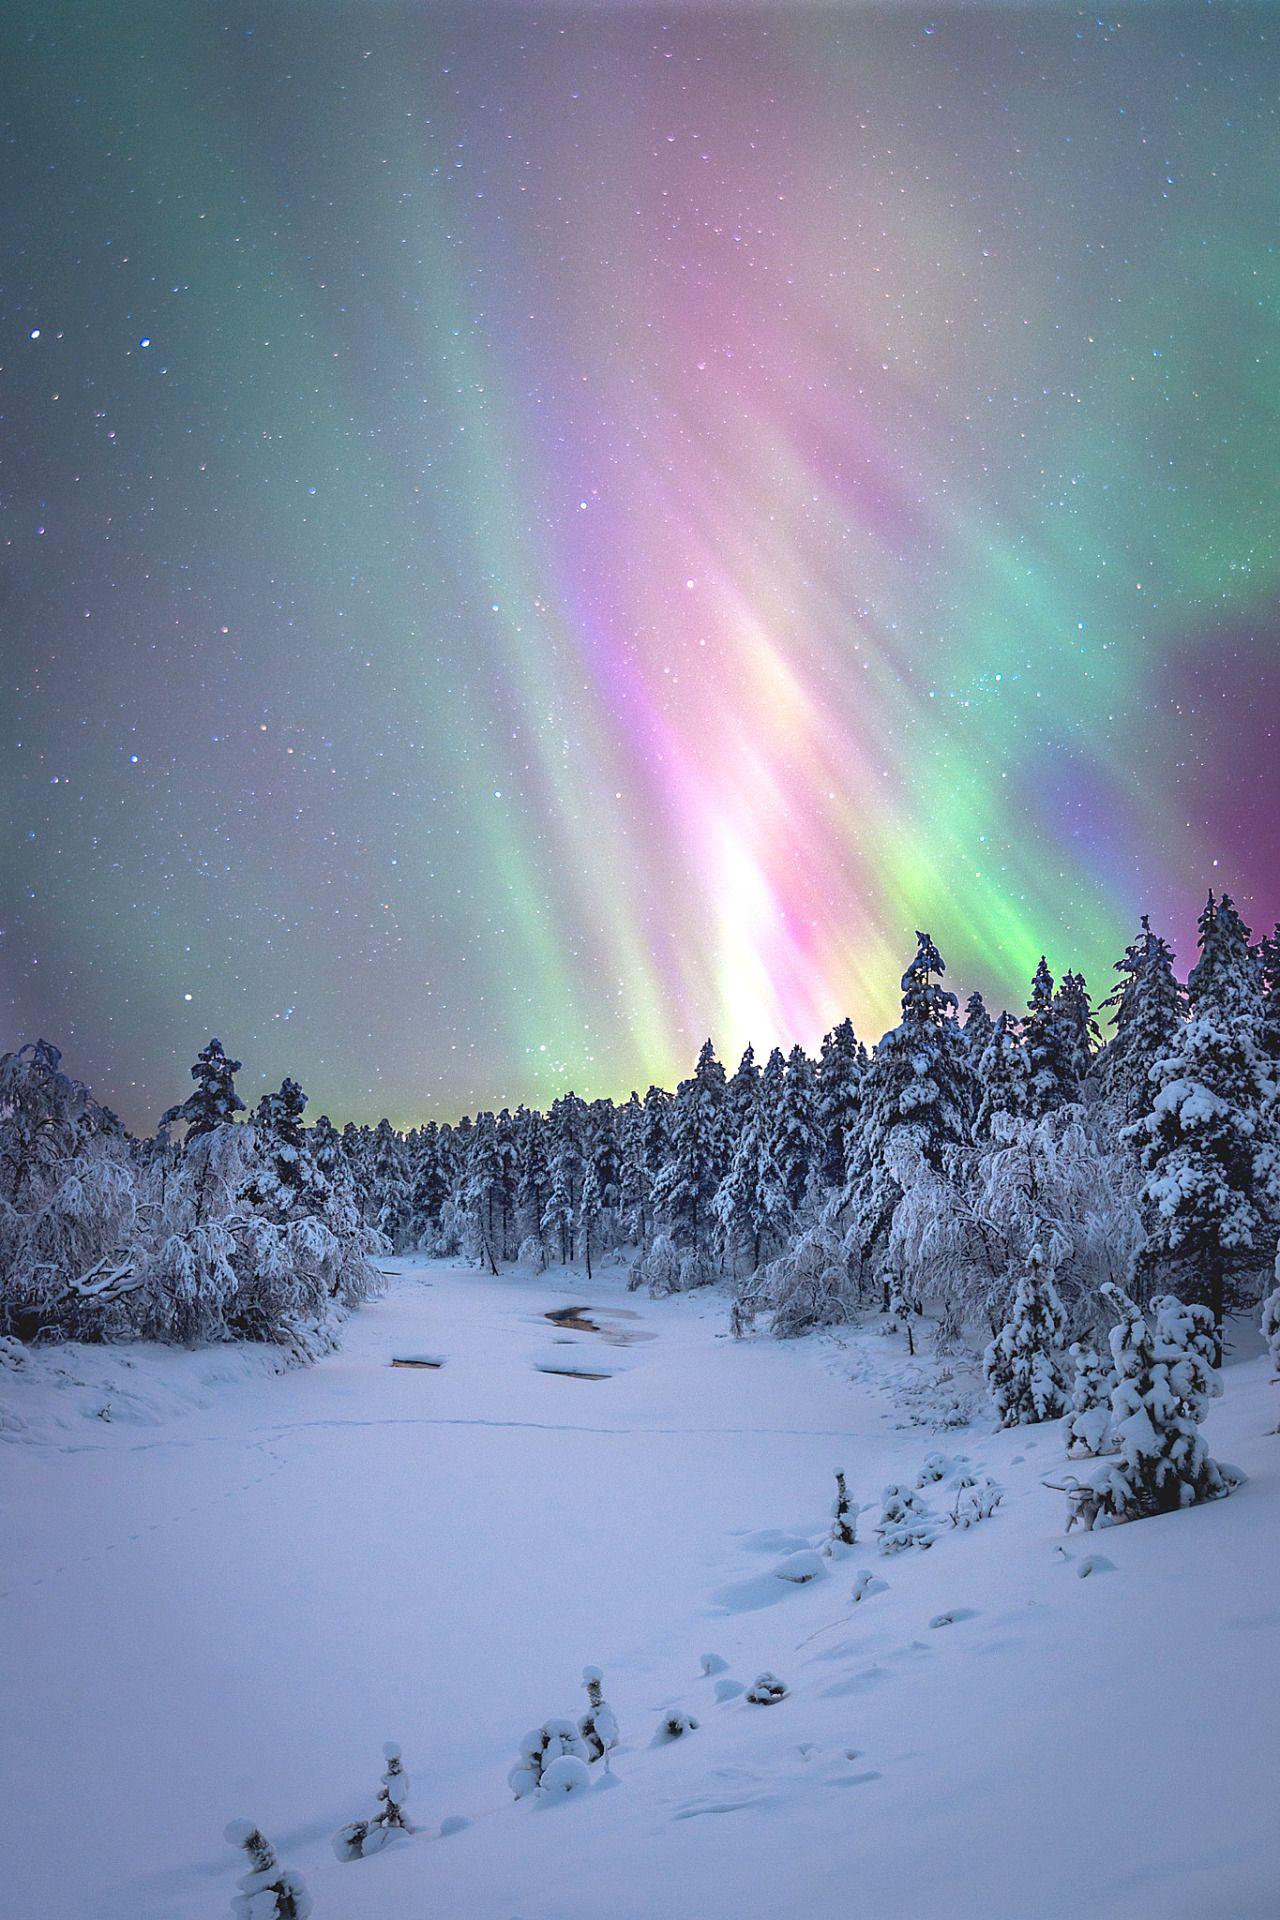 Northern Lights, Winter Landscape, Scenery